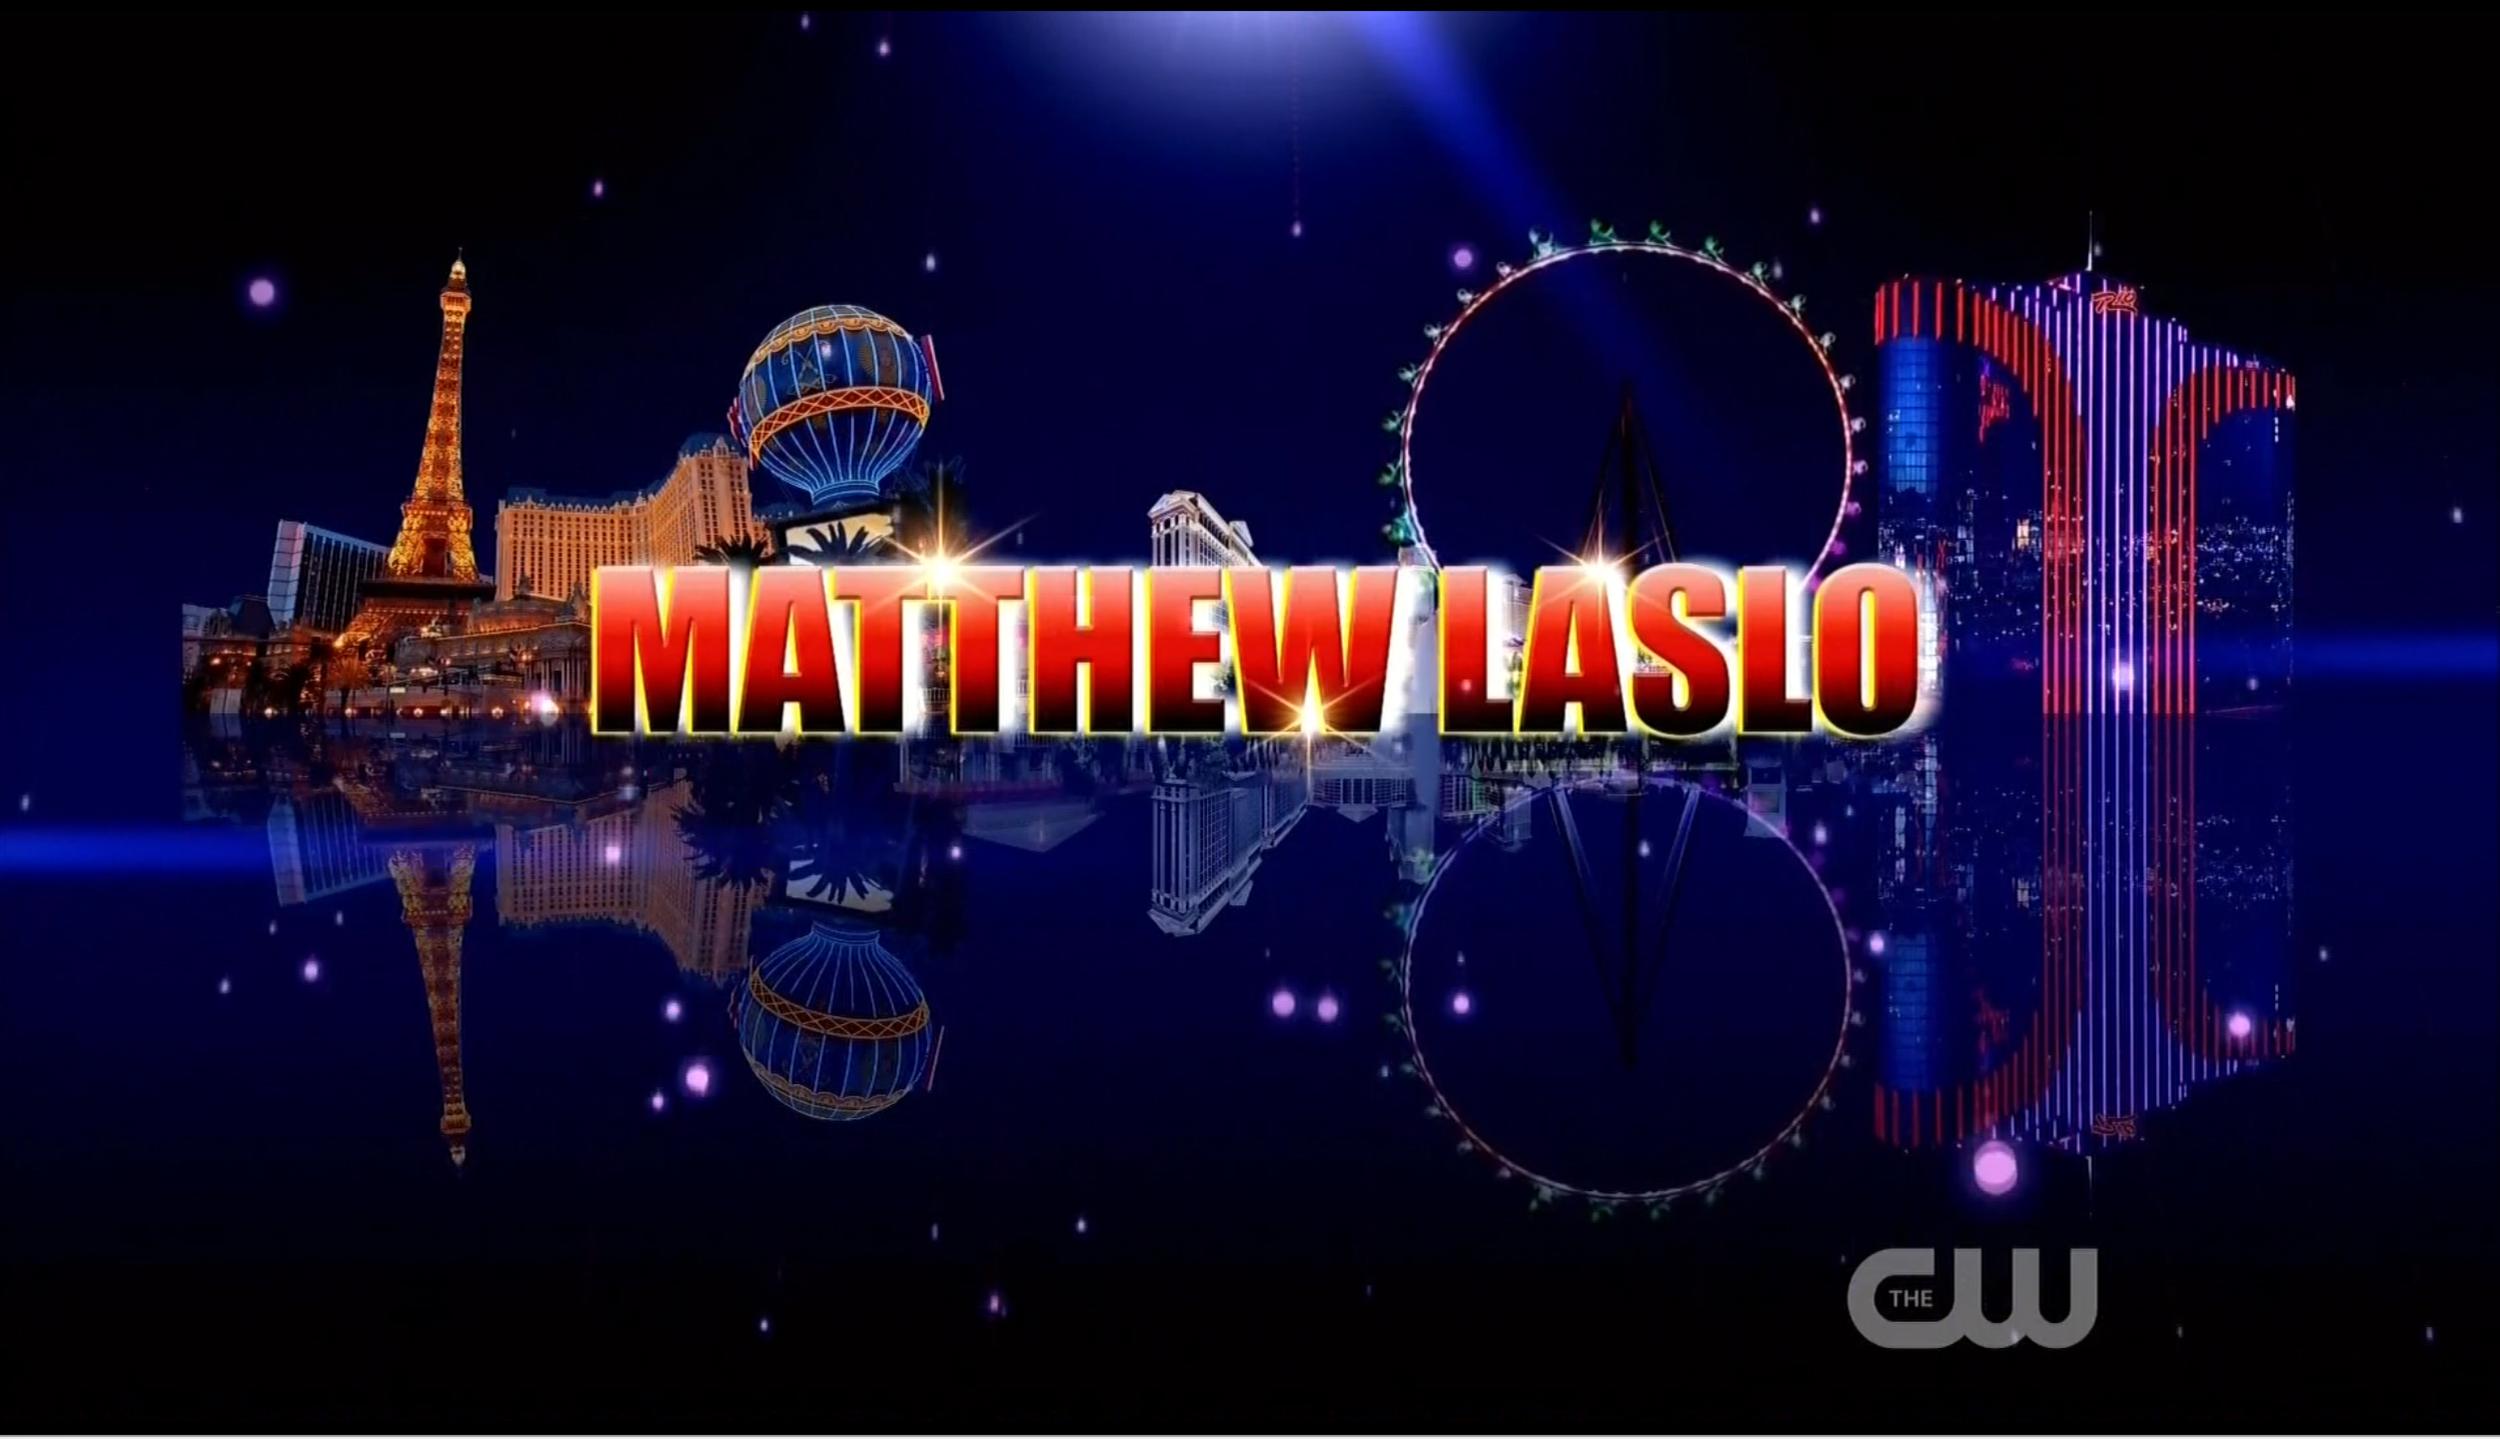 Matthew Laslo title page PTFU.png